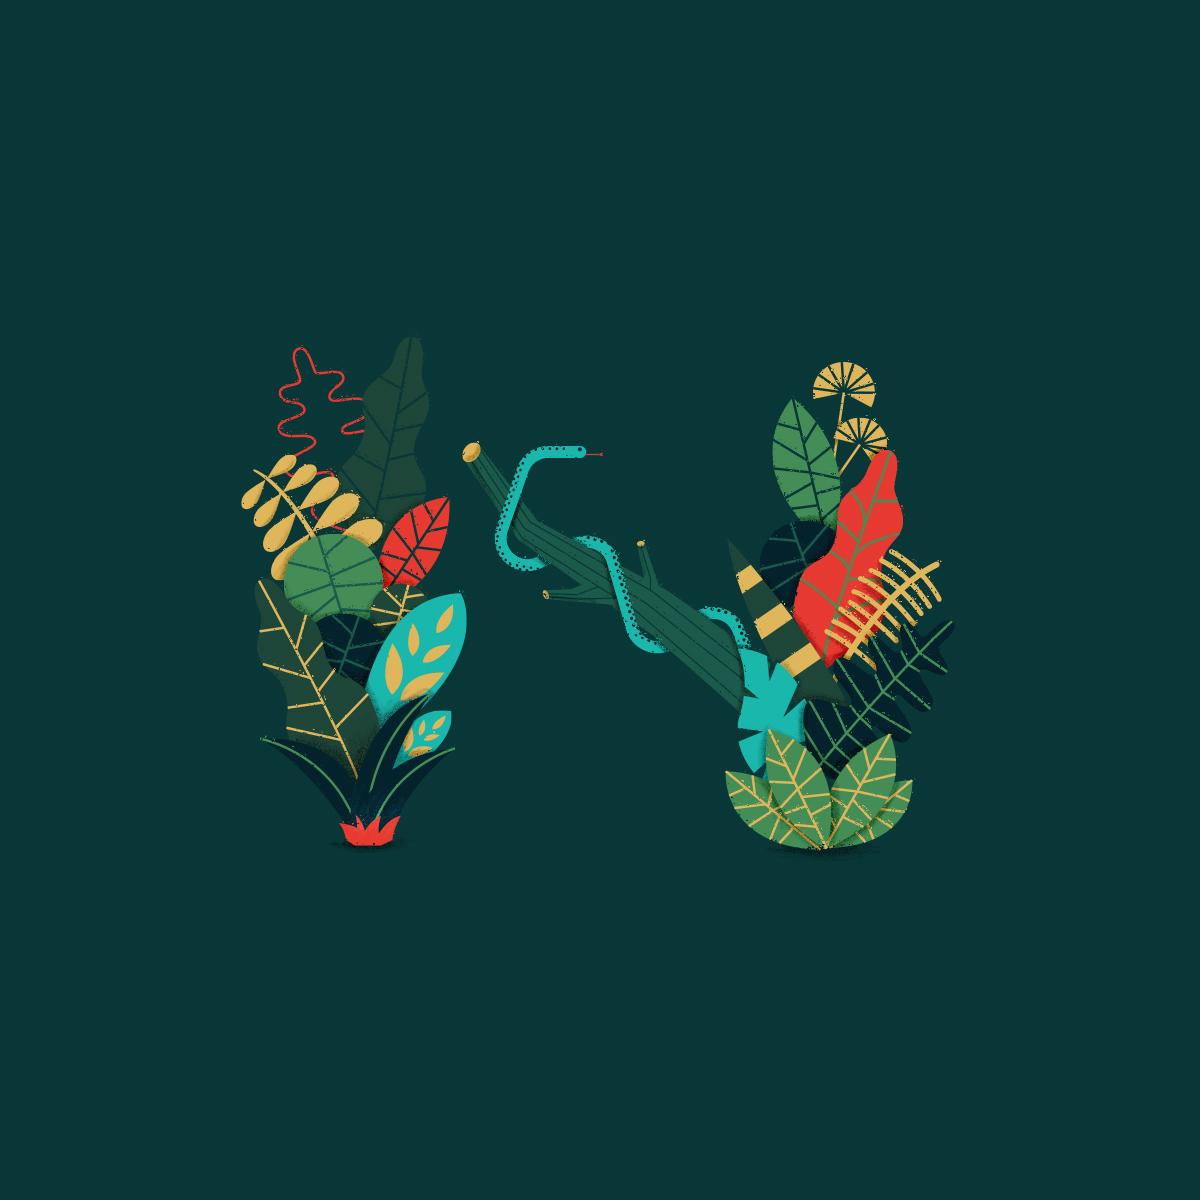 Illustration of the nature symbolizing the letter N